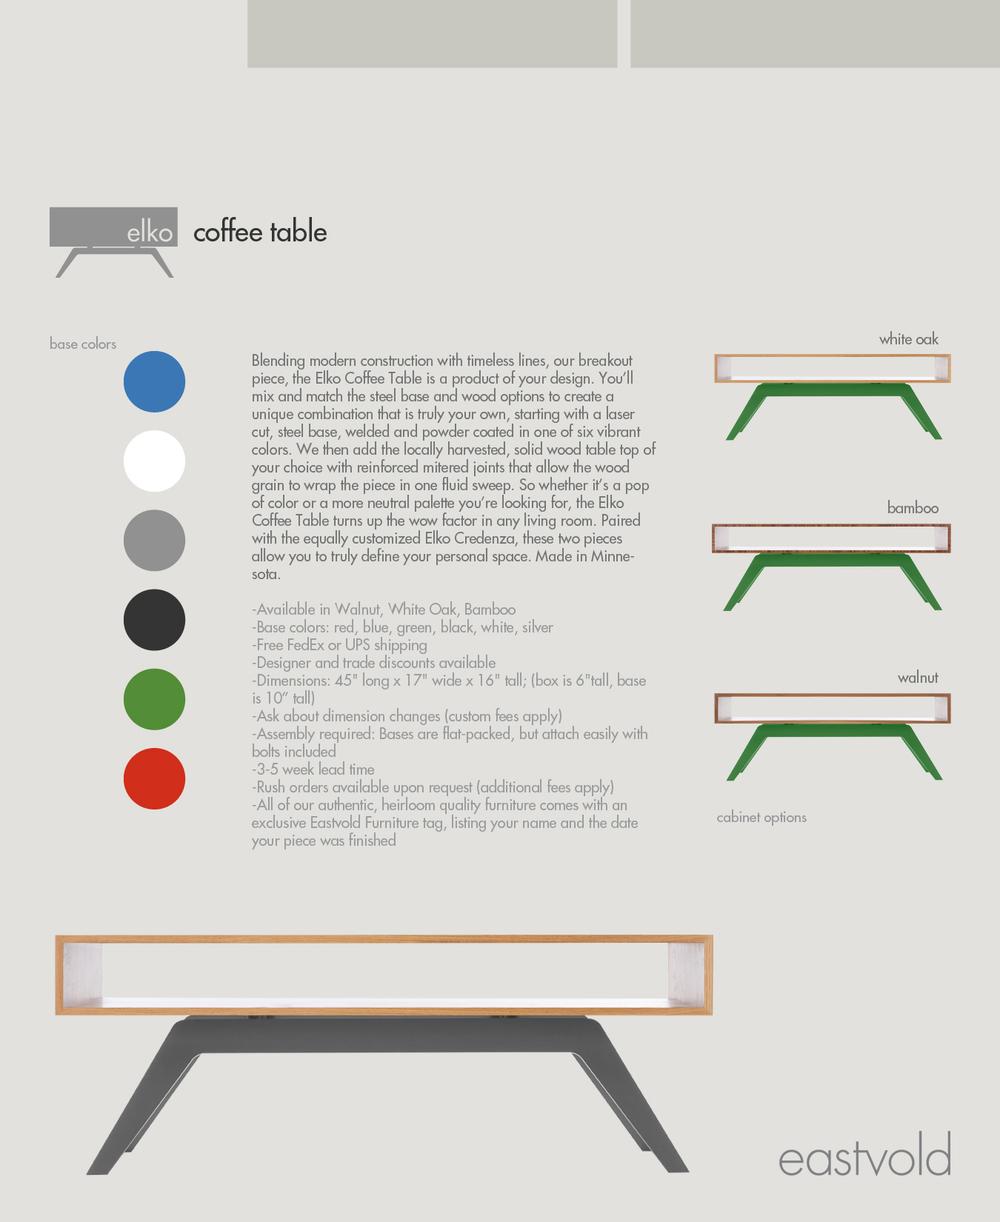 ELKO_COFFEE_TABLE_SELL_SHEET_BACK copy.jpg